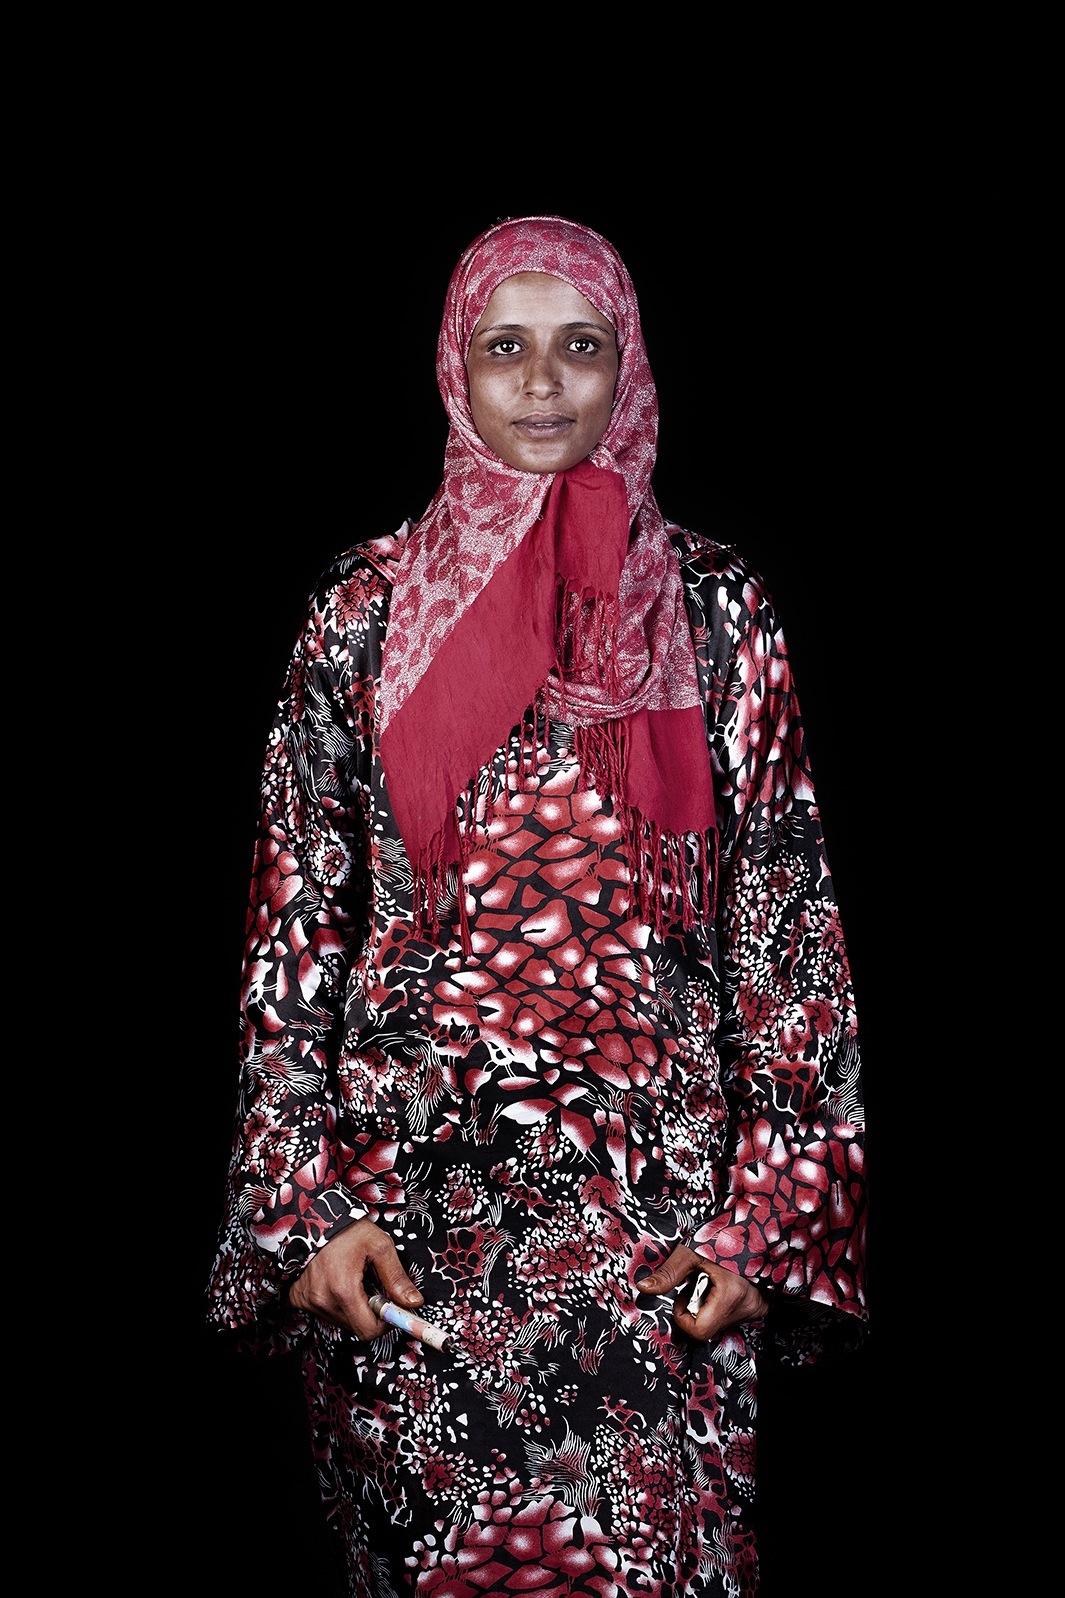 Марокканцы - портреты от Лейлы Алауи-07